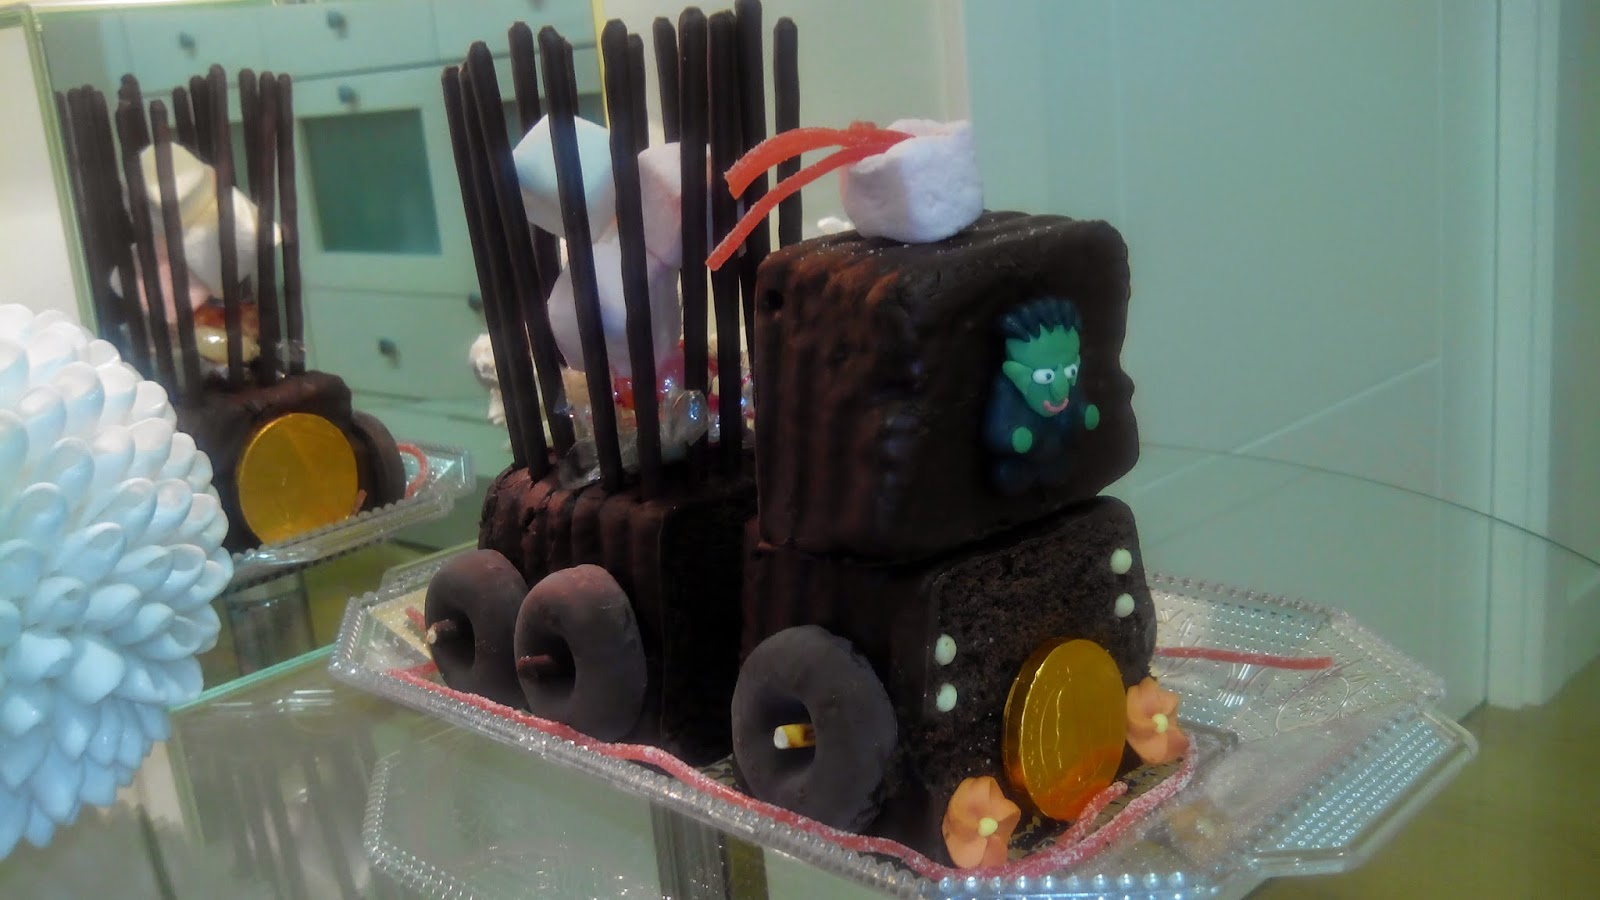 Tarta tren de chocolate, bizcocho chocolate, tarta chocolate, tarta tren, tarta halloween, tarta cumpleaños, tarta divertida